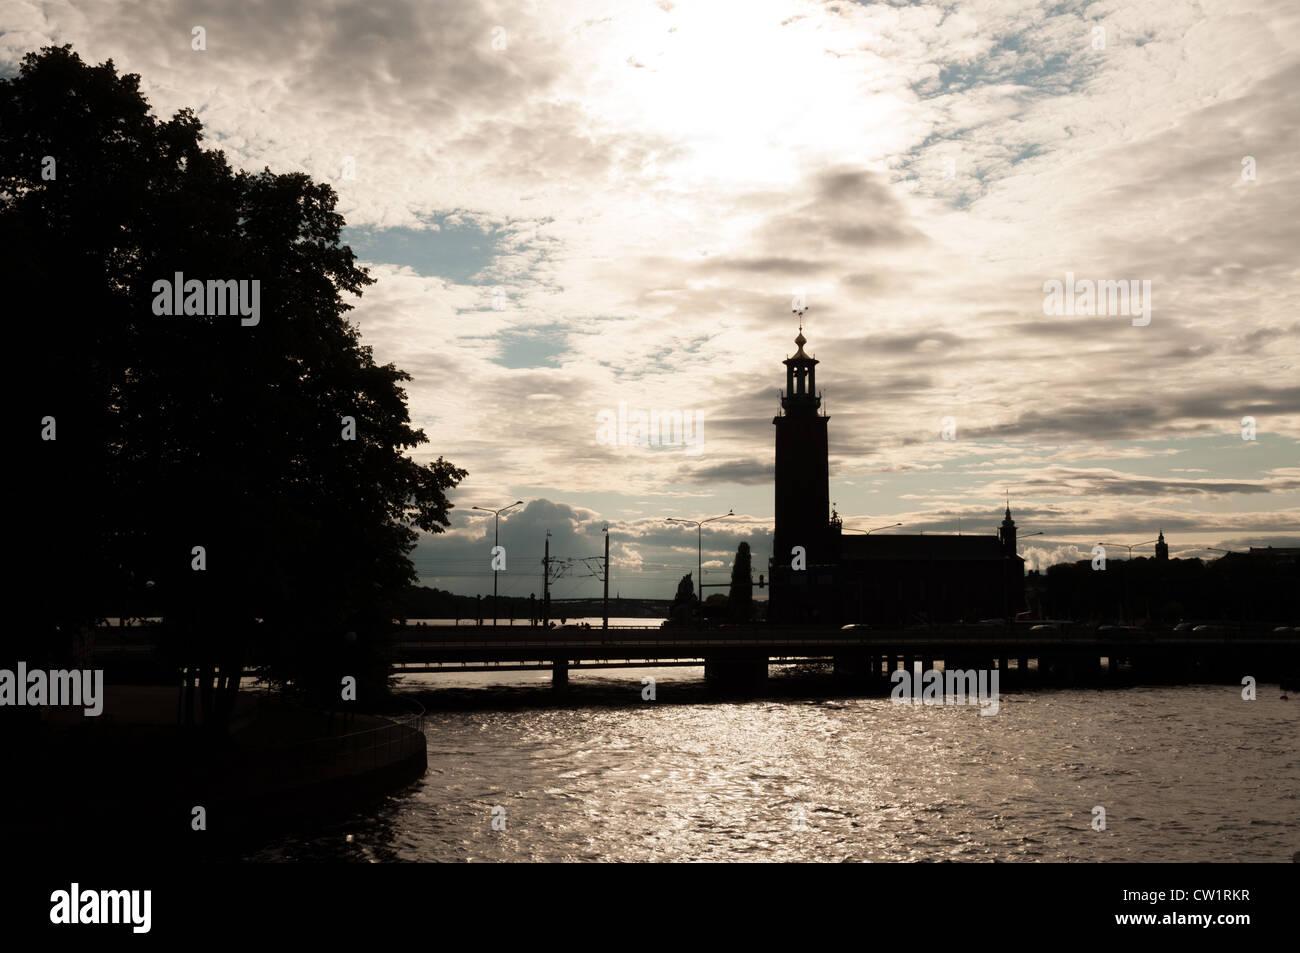 The City Hall of Stockholm - Stadshuset - Sweden - Stock Image